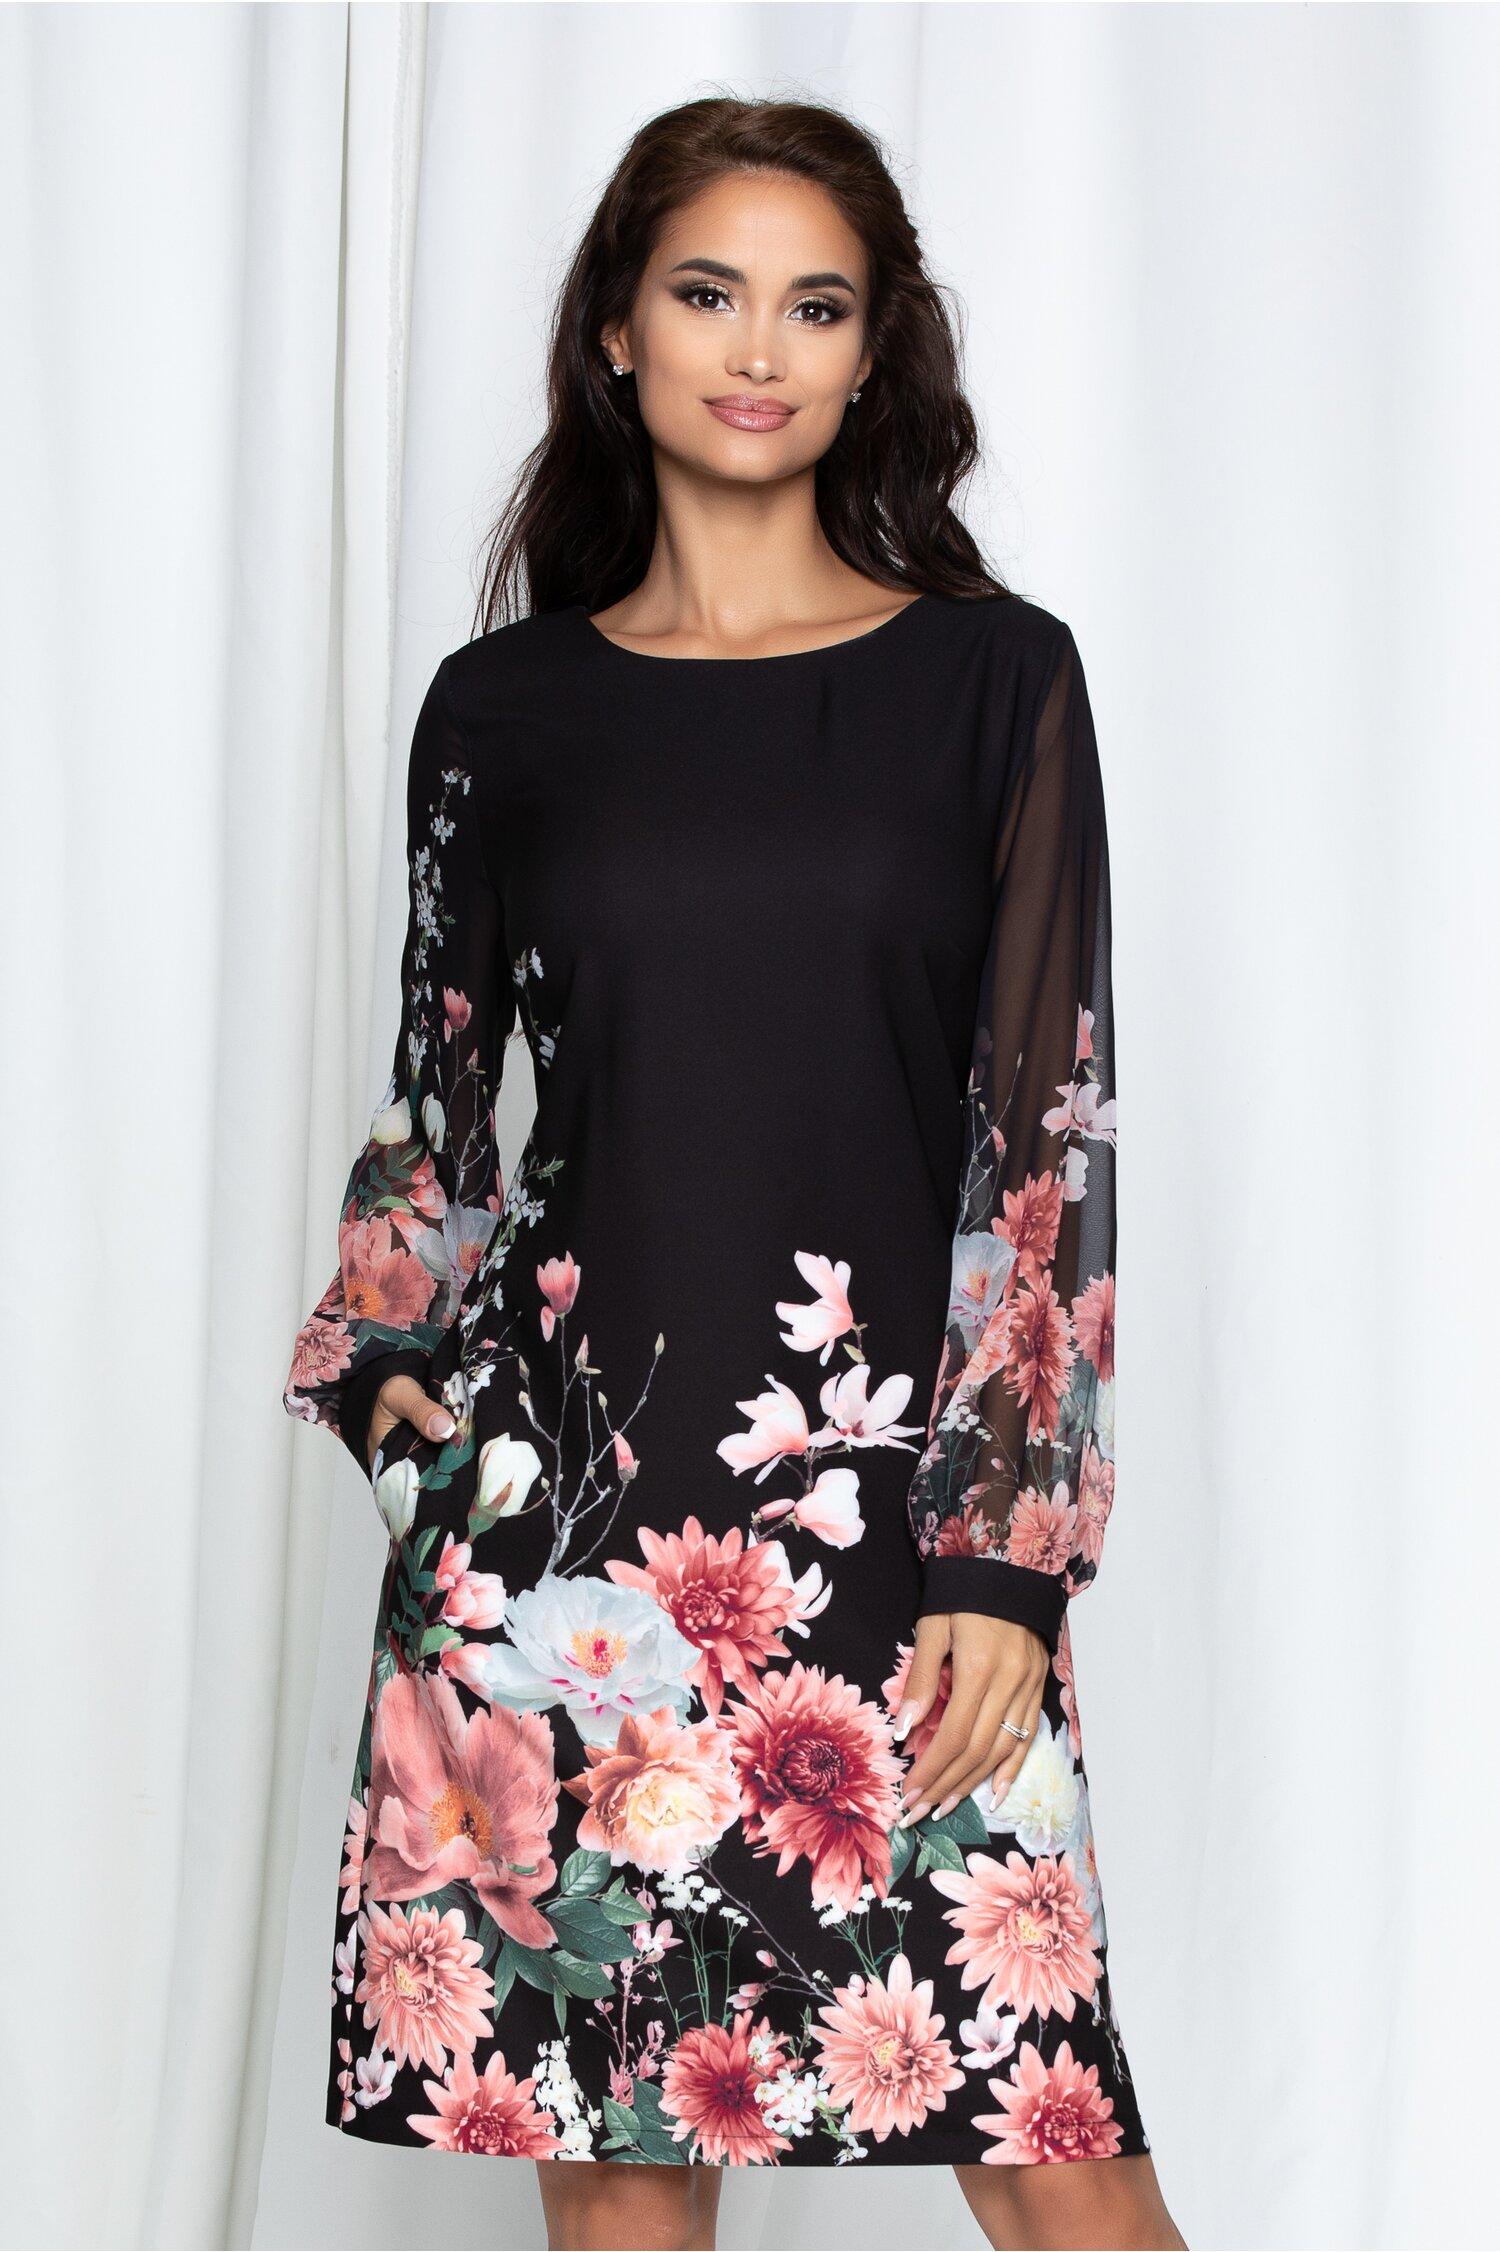 Rochie Flora neagra cu imprimeuri florale si maneci din voal